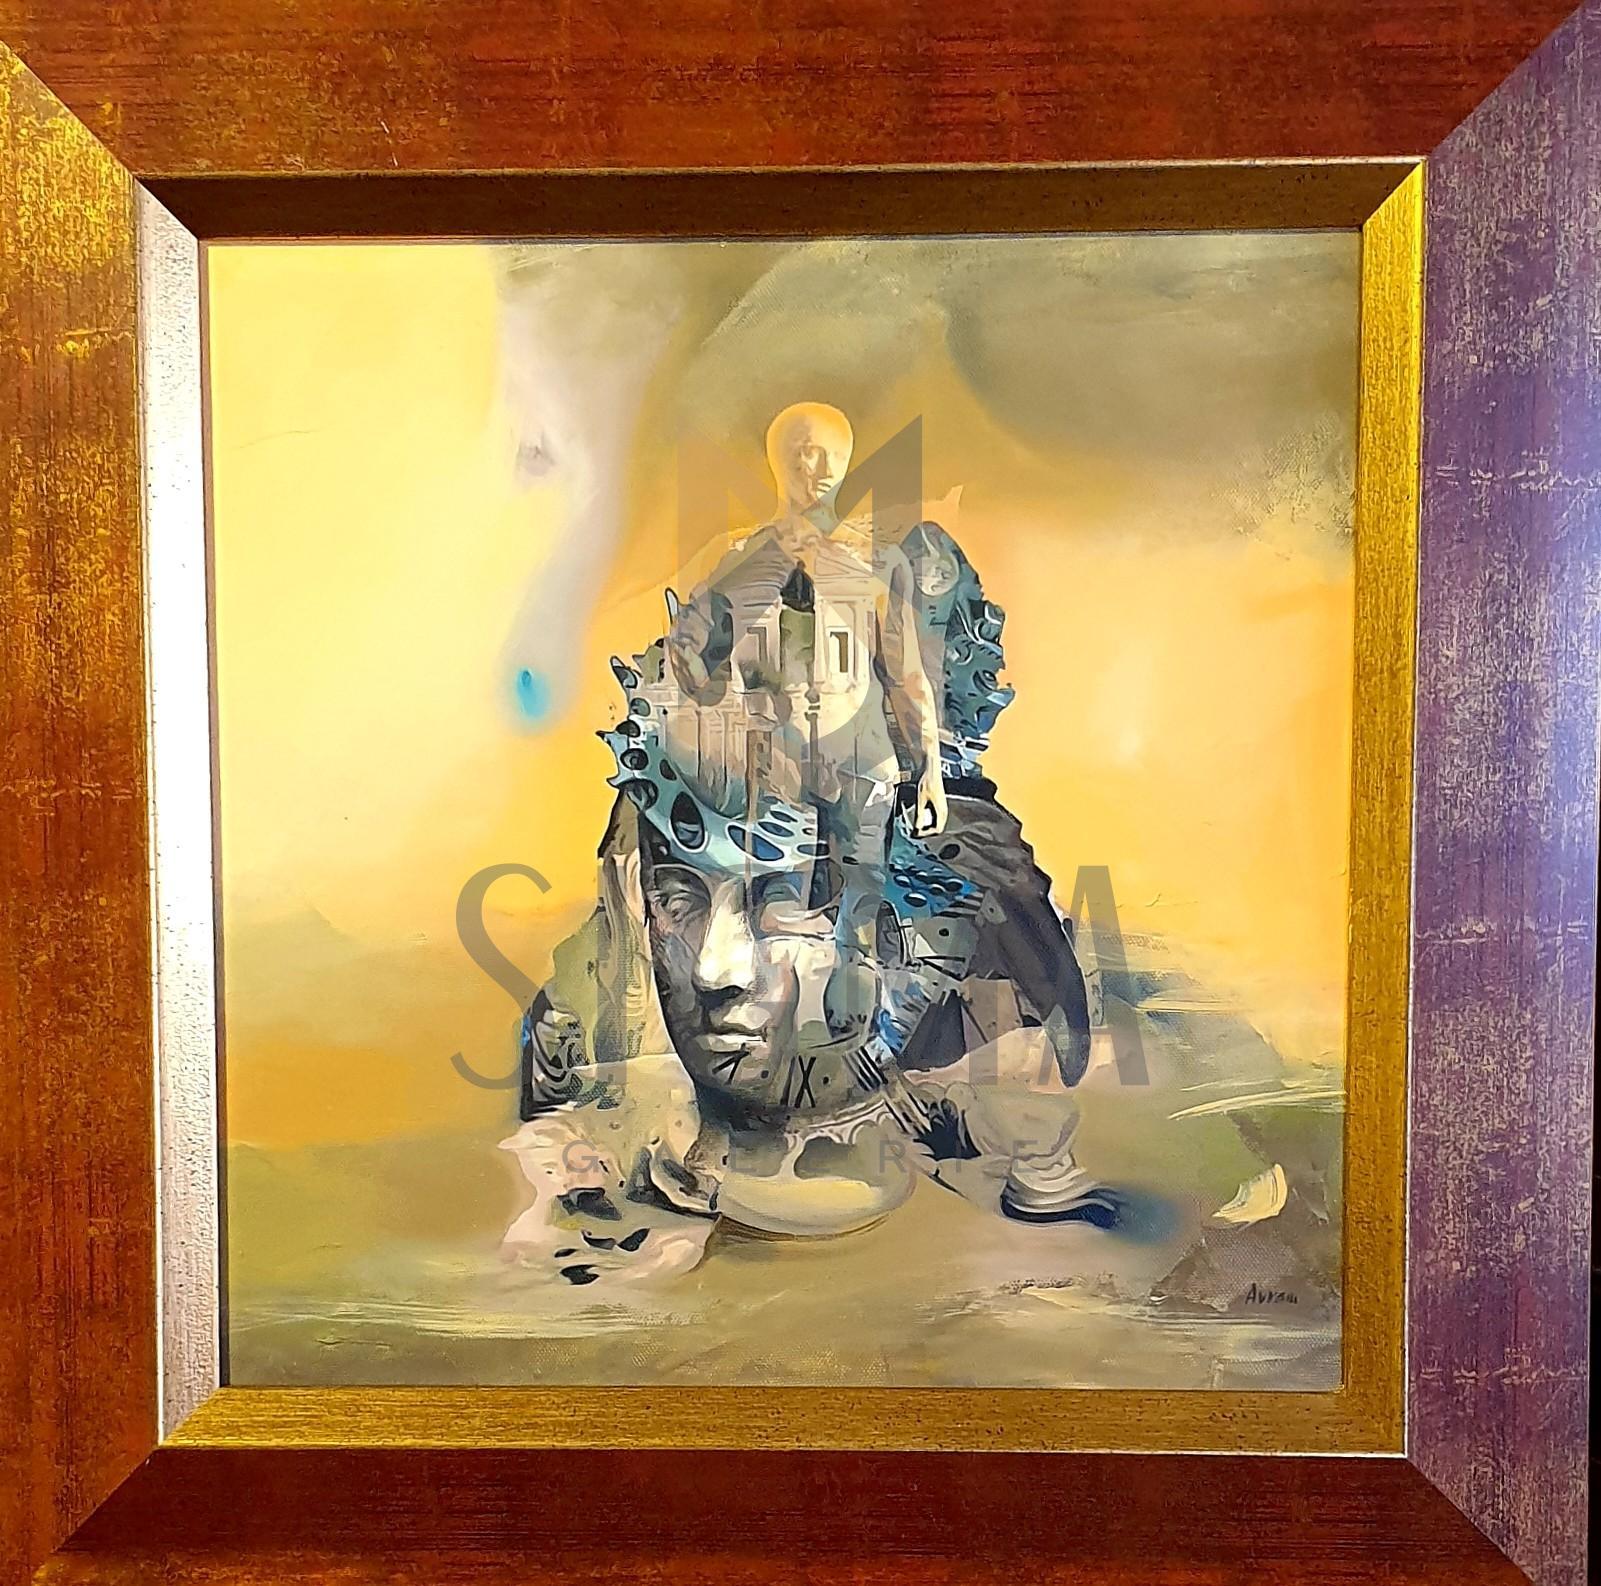 "TABLOU, OVIDIU AVRAM  "" Compozitie - Timpul "", u/p, 35 x 35 cm"